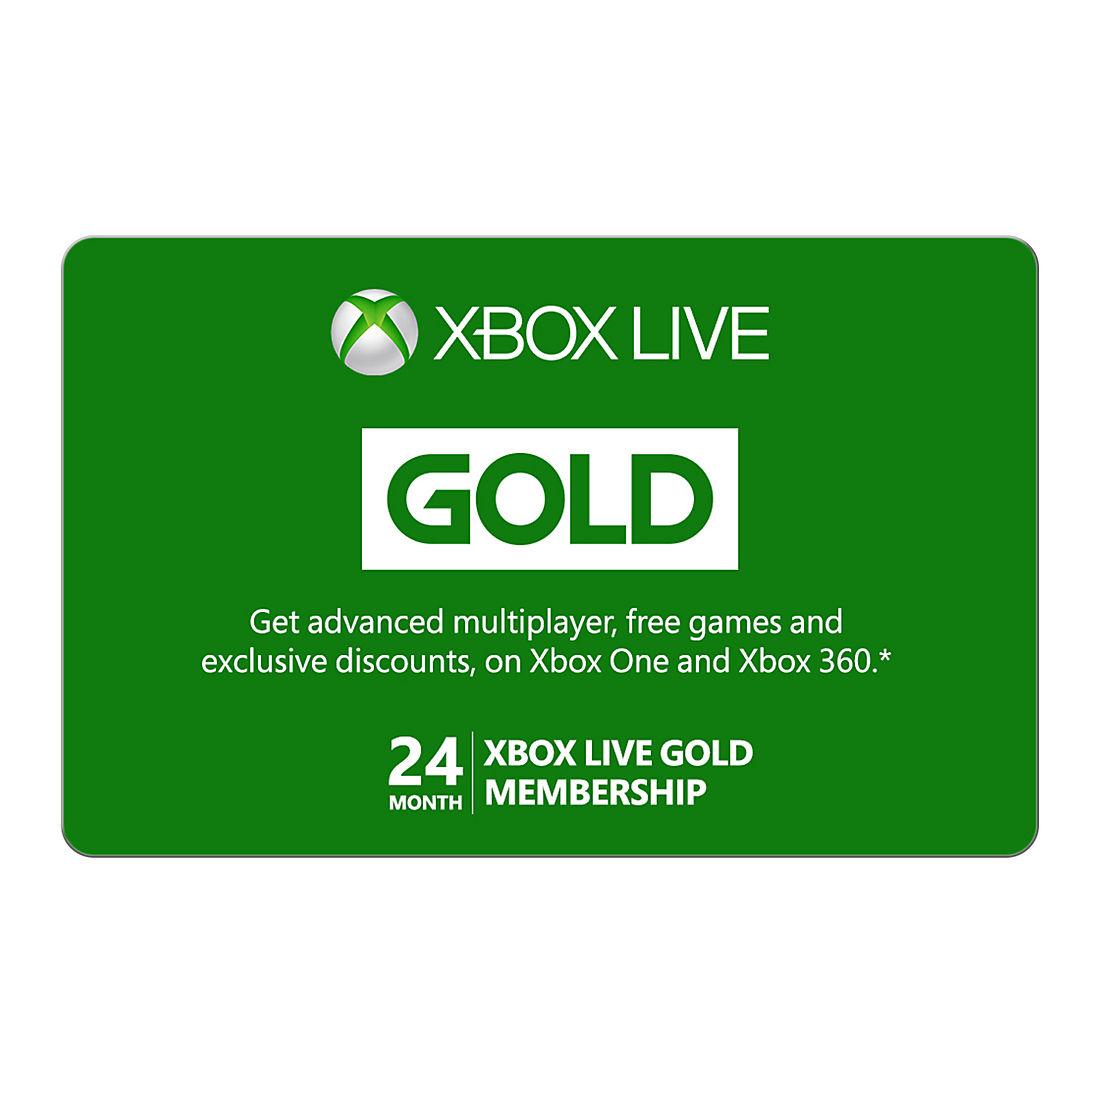 Xbox Live Gold 24-Month Membership